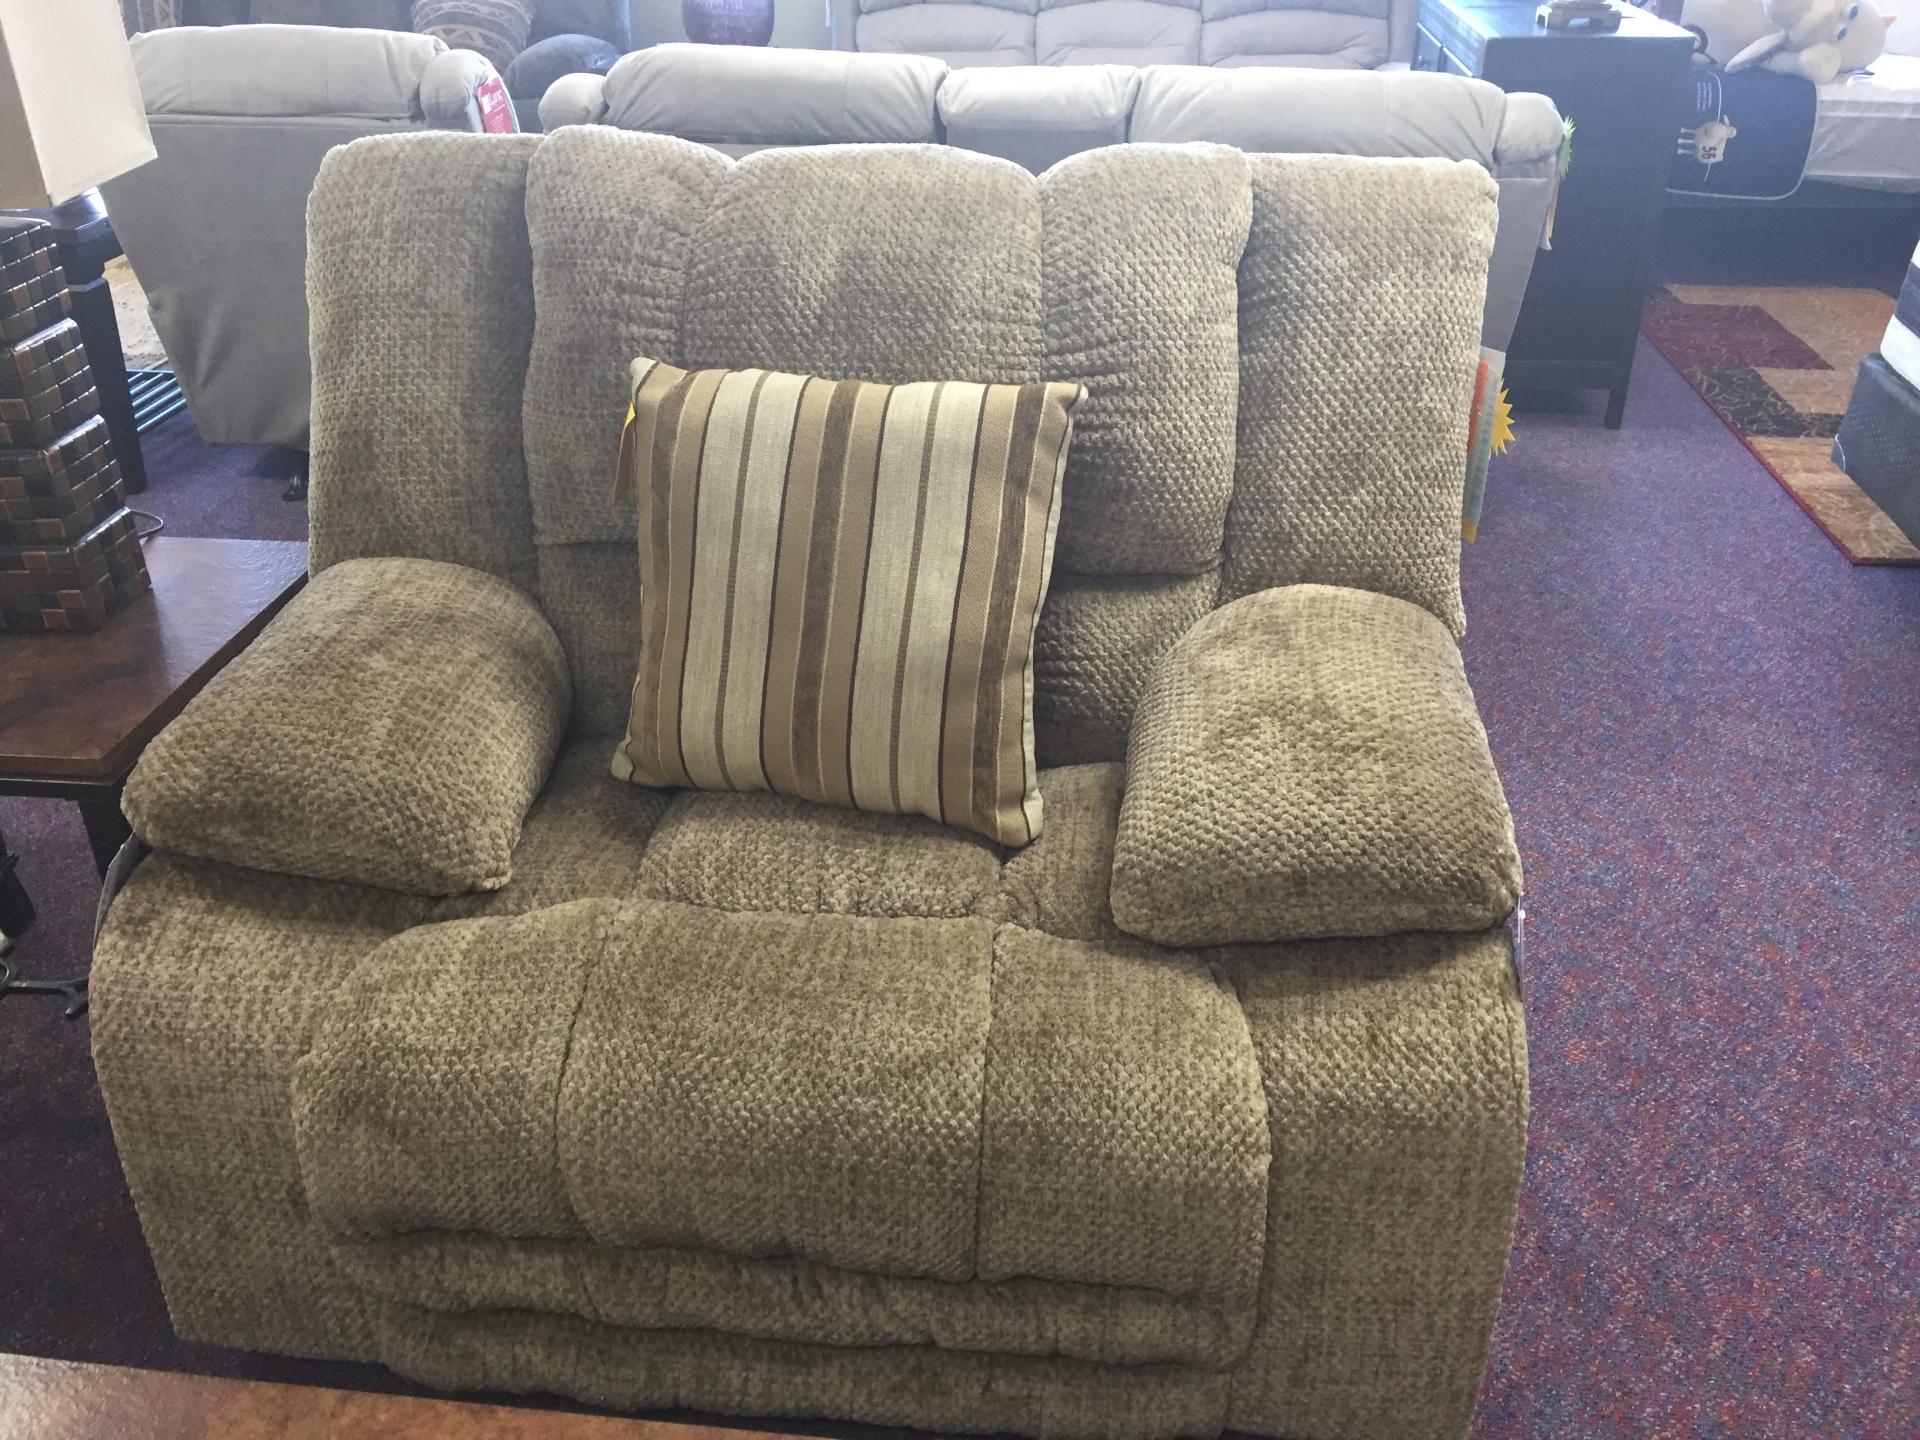 Catnapper Branson Chair 1/2- $699.95 SALE PRICE $559.00